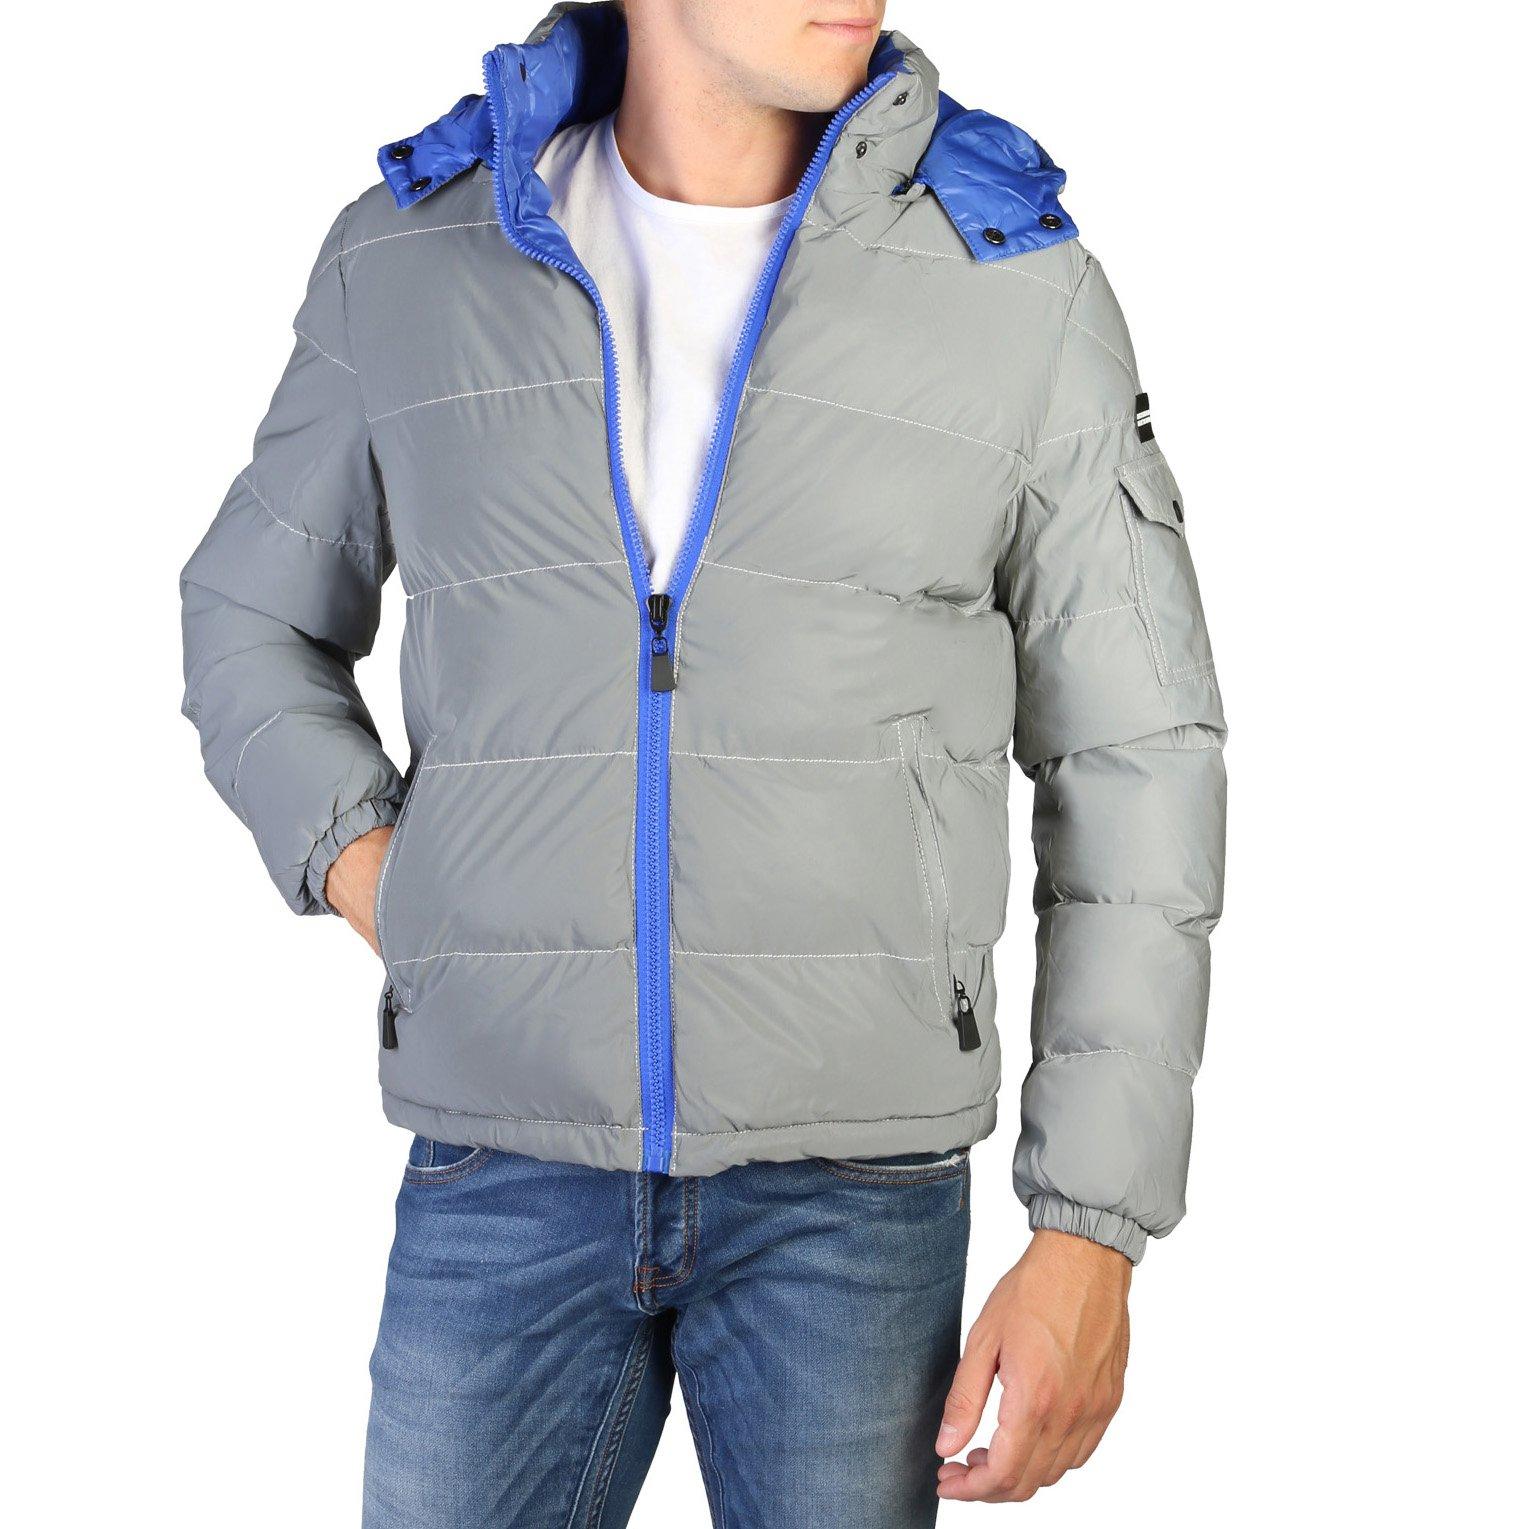 Alessandro Dell'Acqua Men's Jacket Grey 348293 - grey-1 L